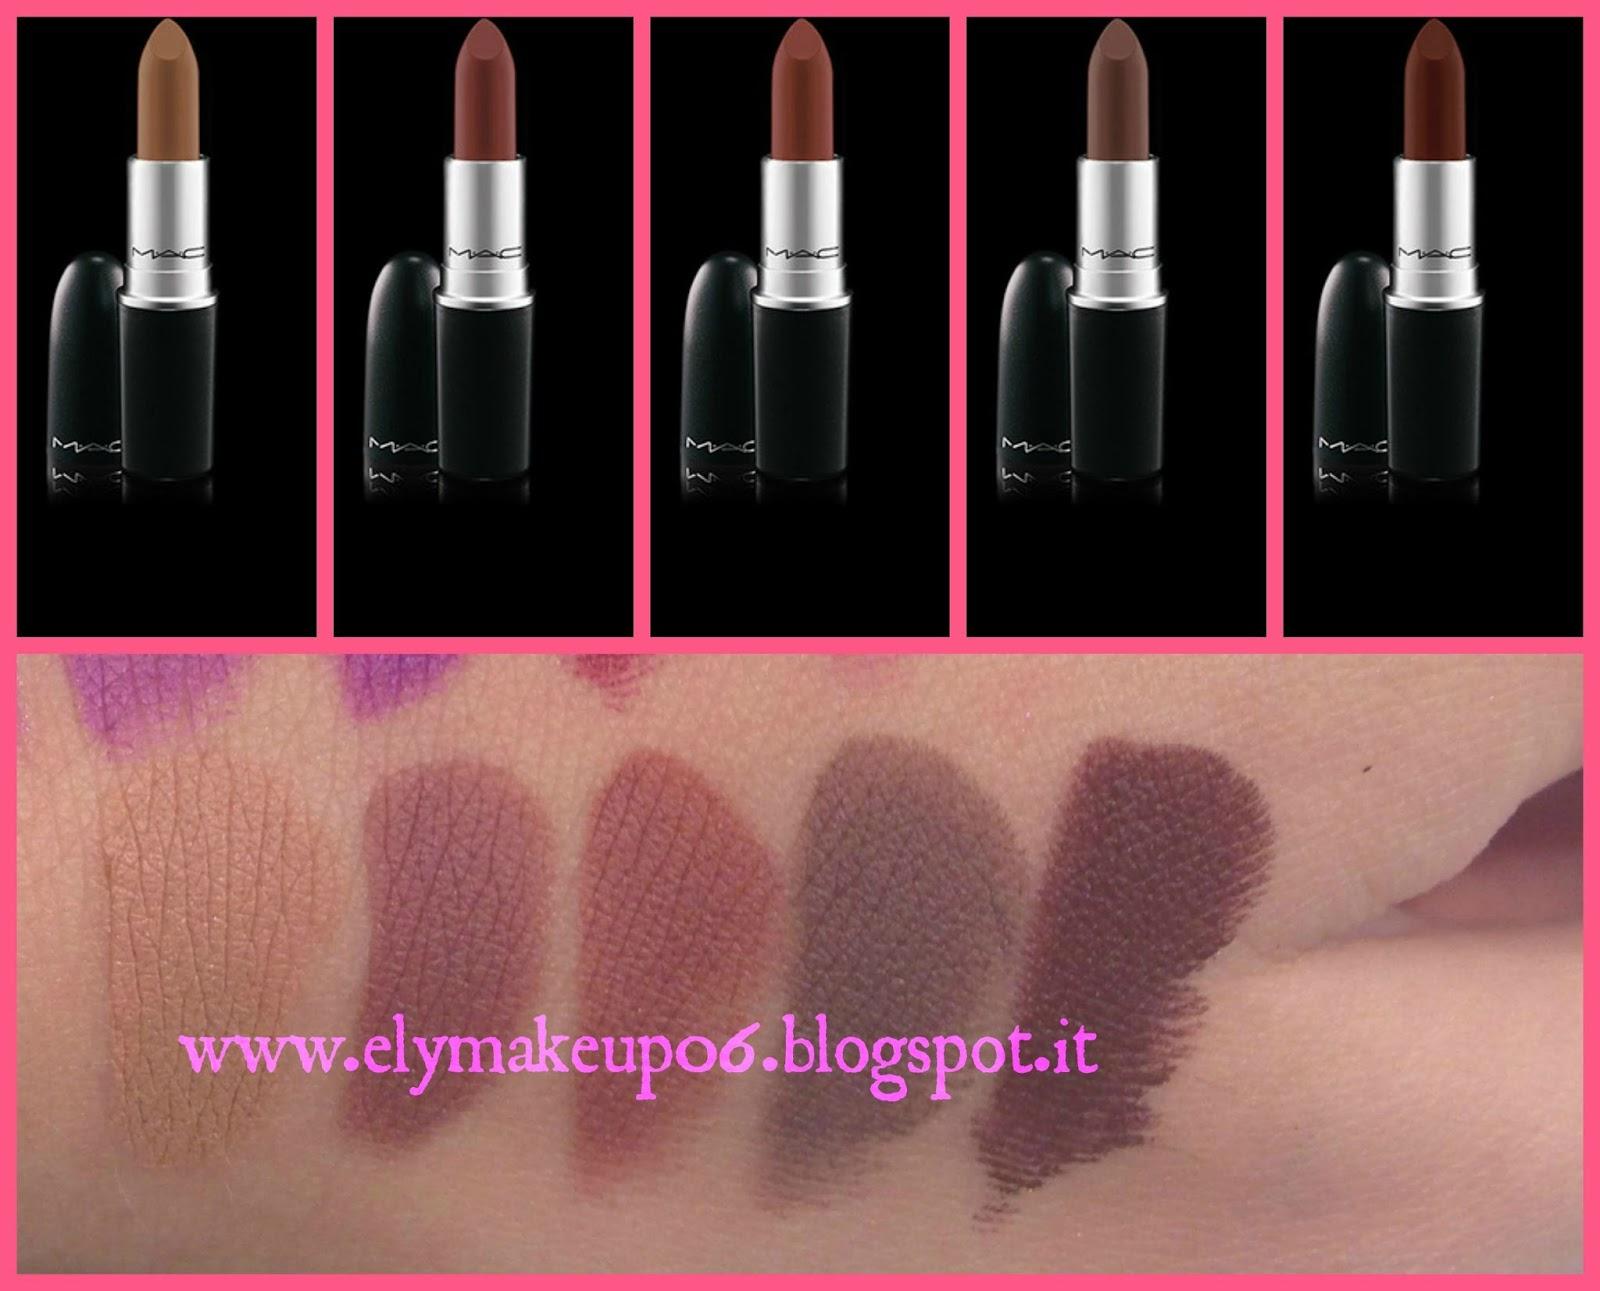 Amato ElyMakeup: Swatch e Haul Mac Lipstick The Matte Lip Collection 2015 CW66